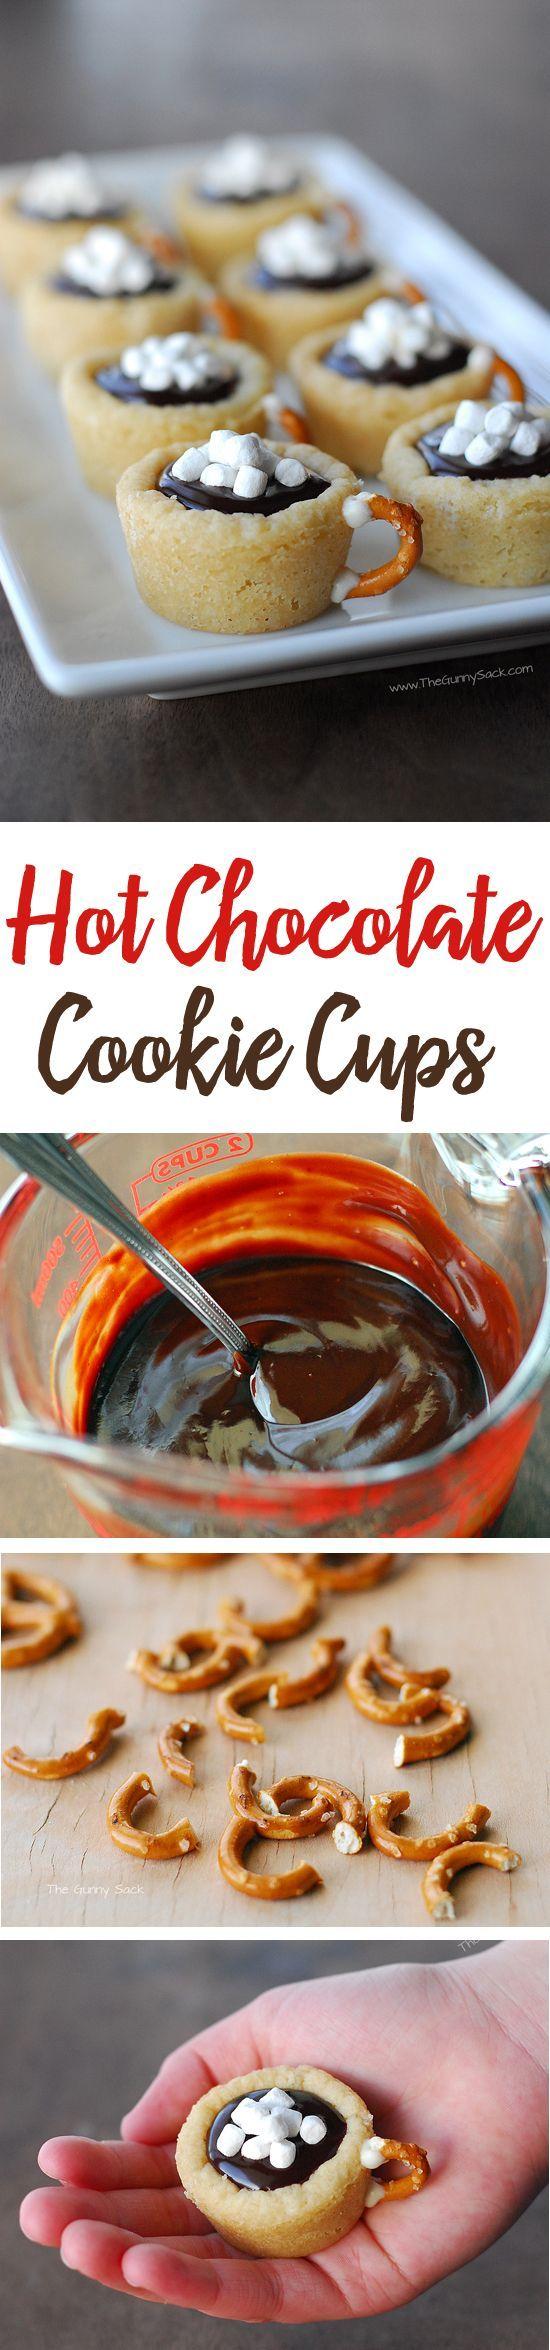 Hot Chocolate Cookie Cups Recipe